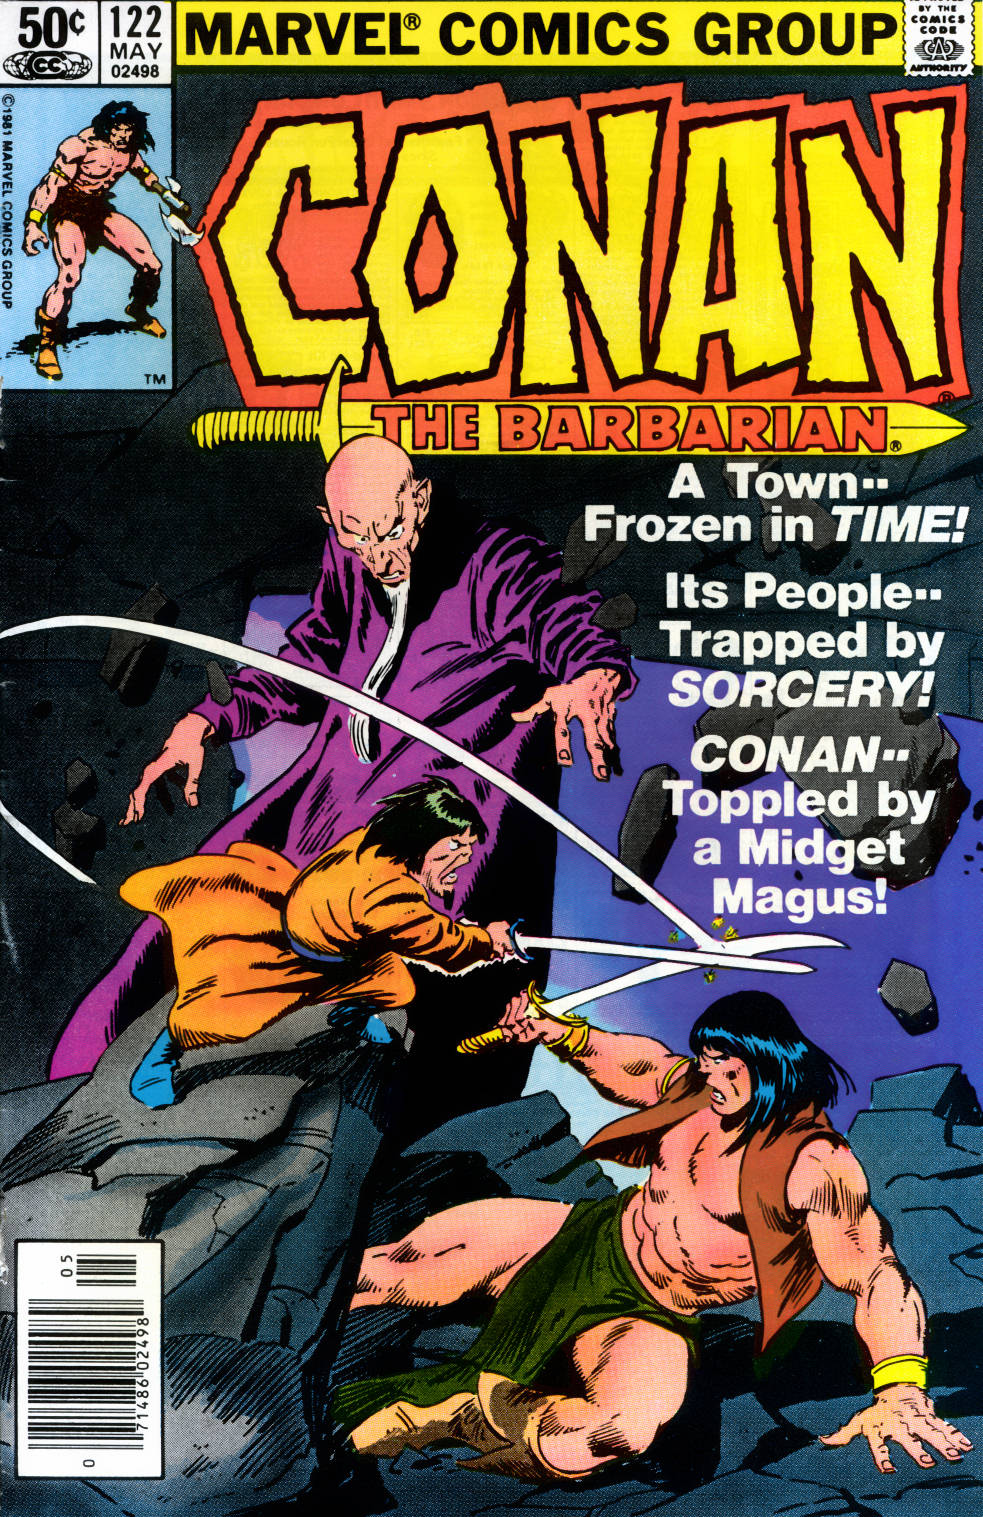 Conan the Barbarian 122